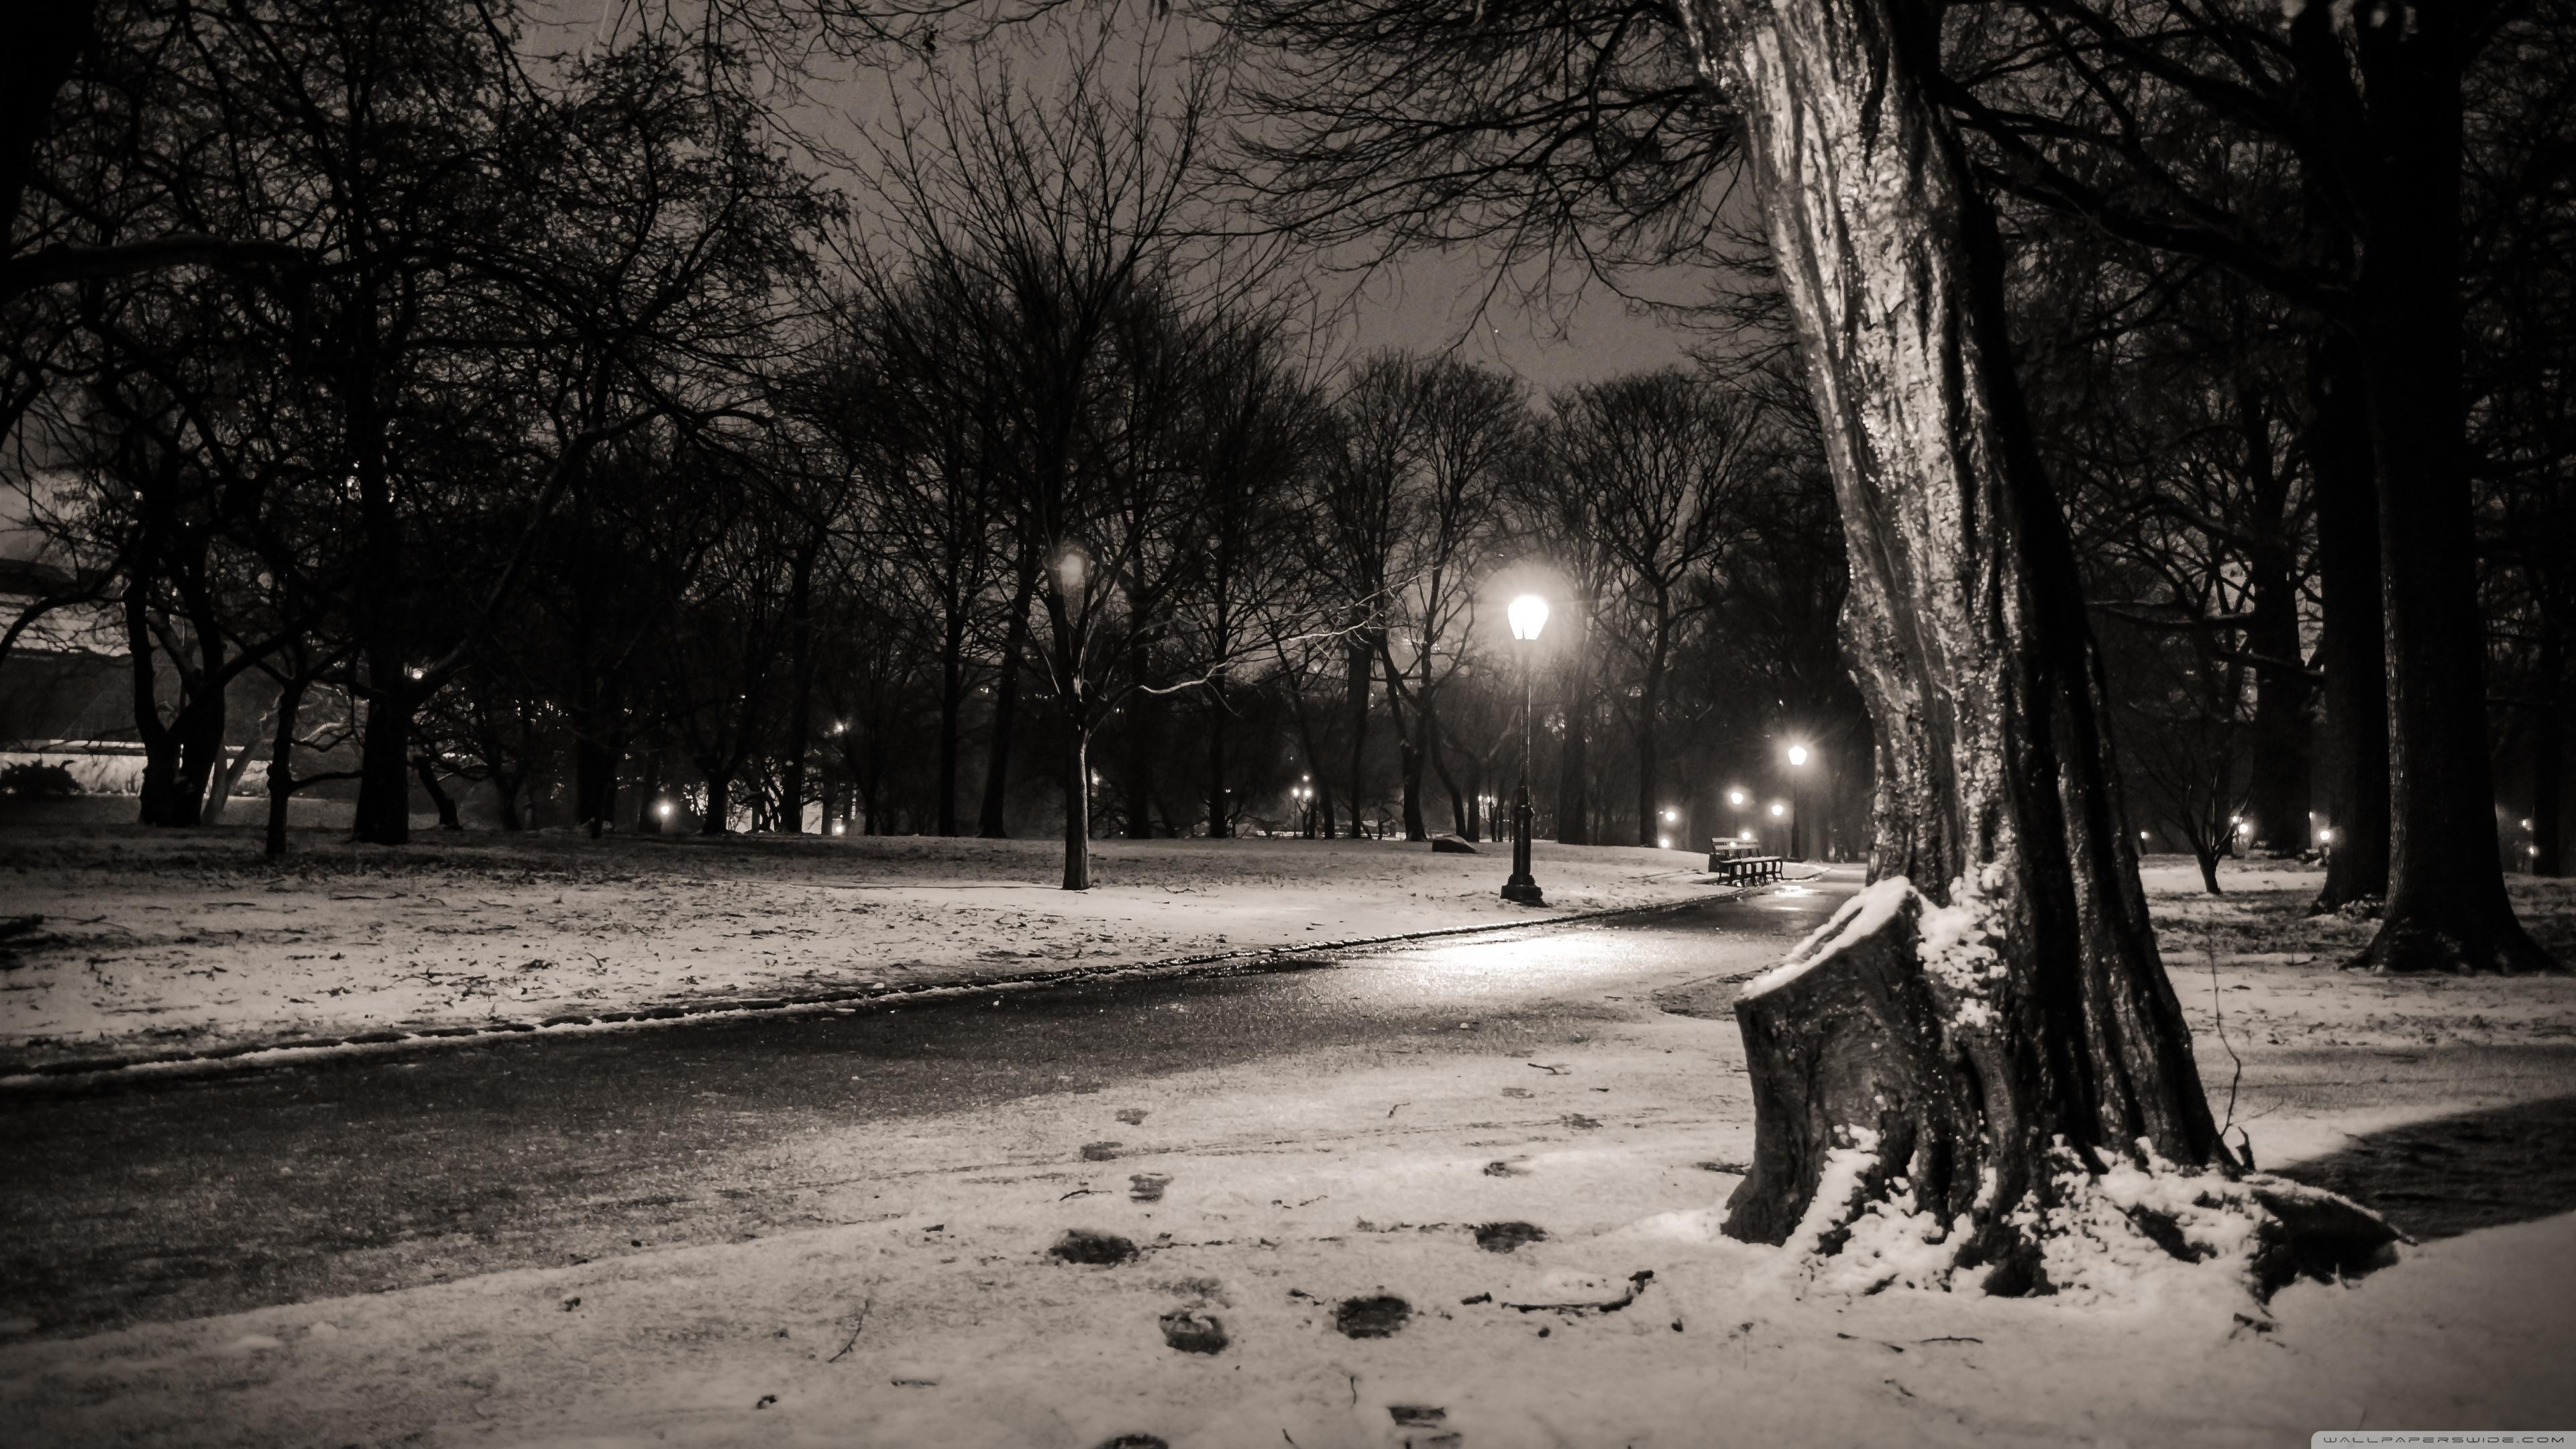 New York City Central Park Footsteps 4K HD Desktop Wallpaper 3840x2160